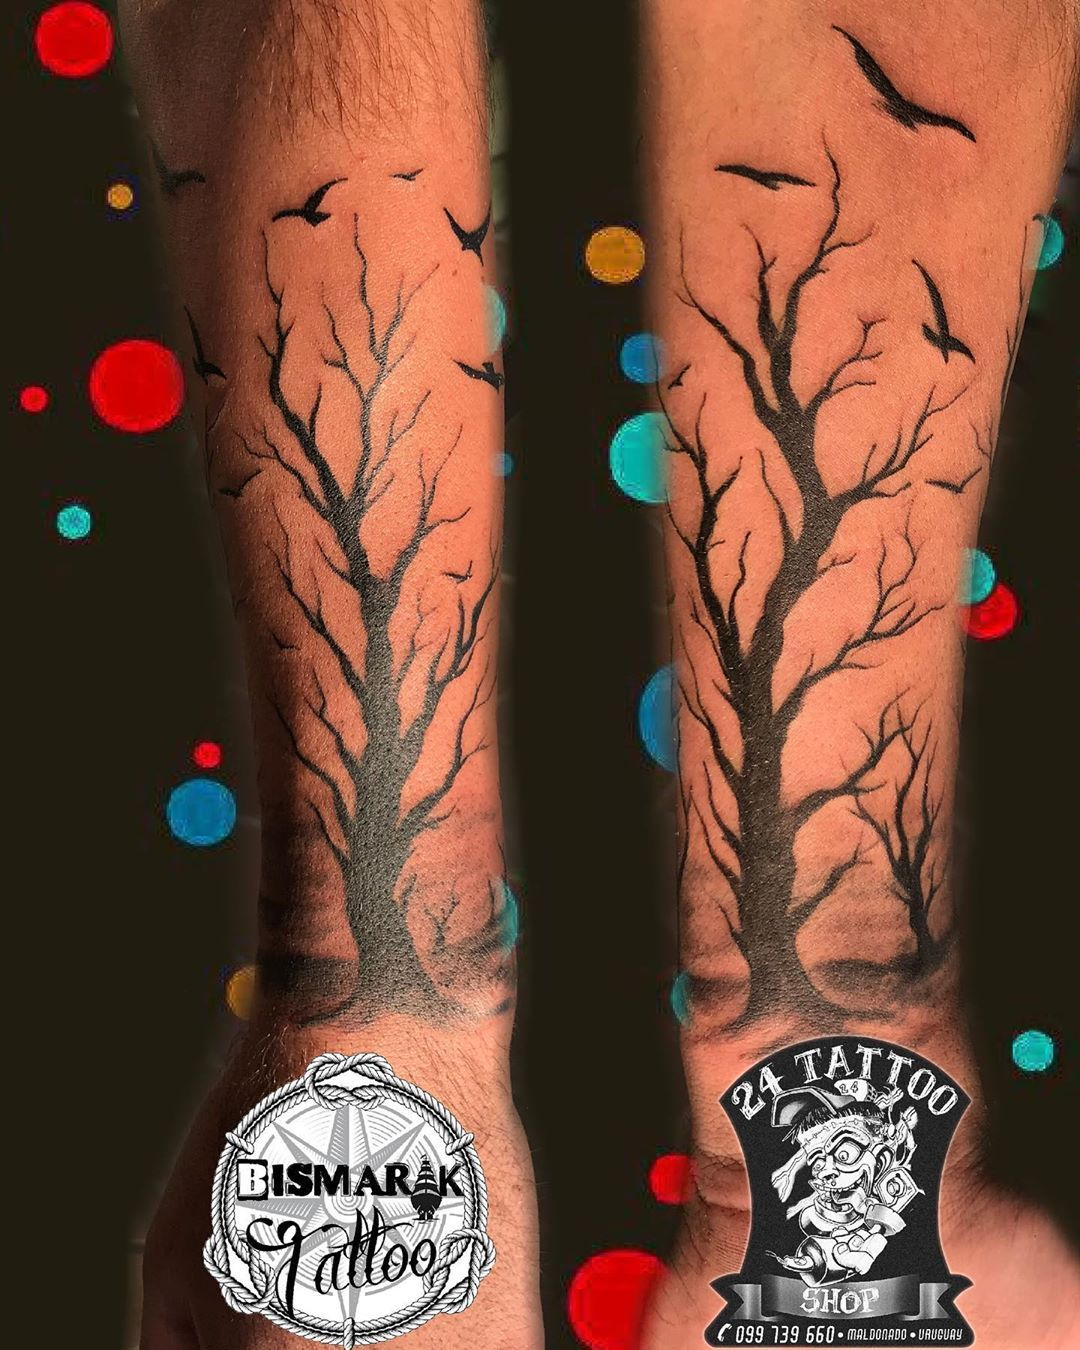 Gracias por confiar en 24 🙏trabajo de MARCOS CARBALLO #tattooparejas 099739660 🤘 🙏 #24tattooshop #maldonado...